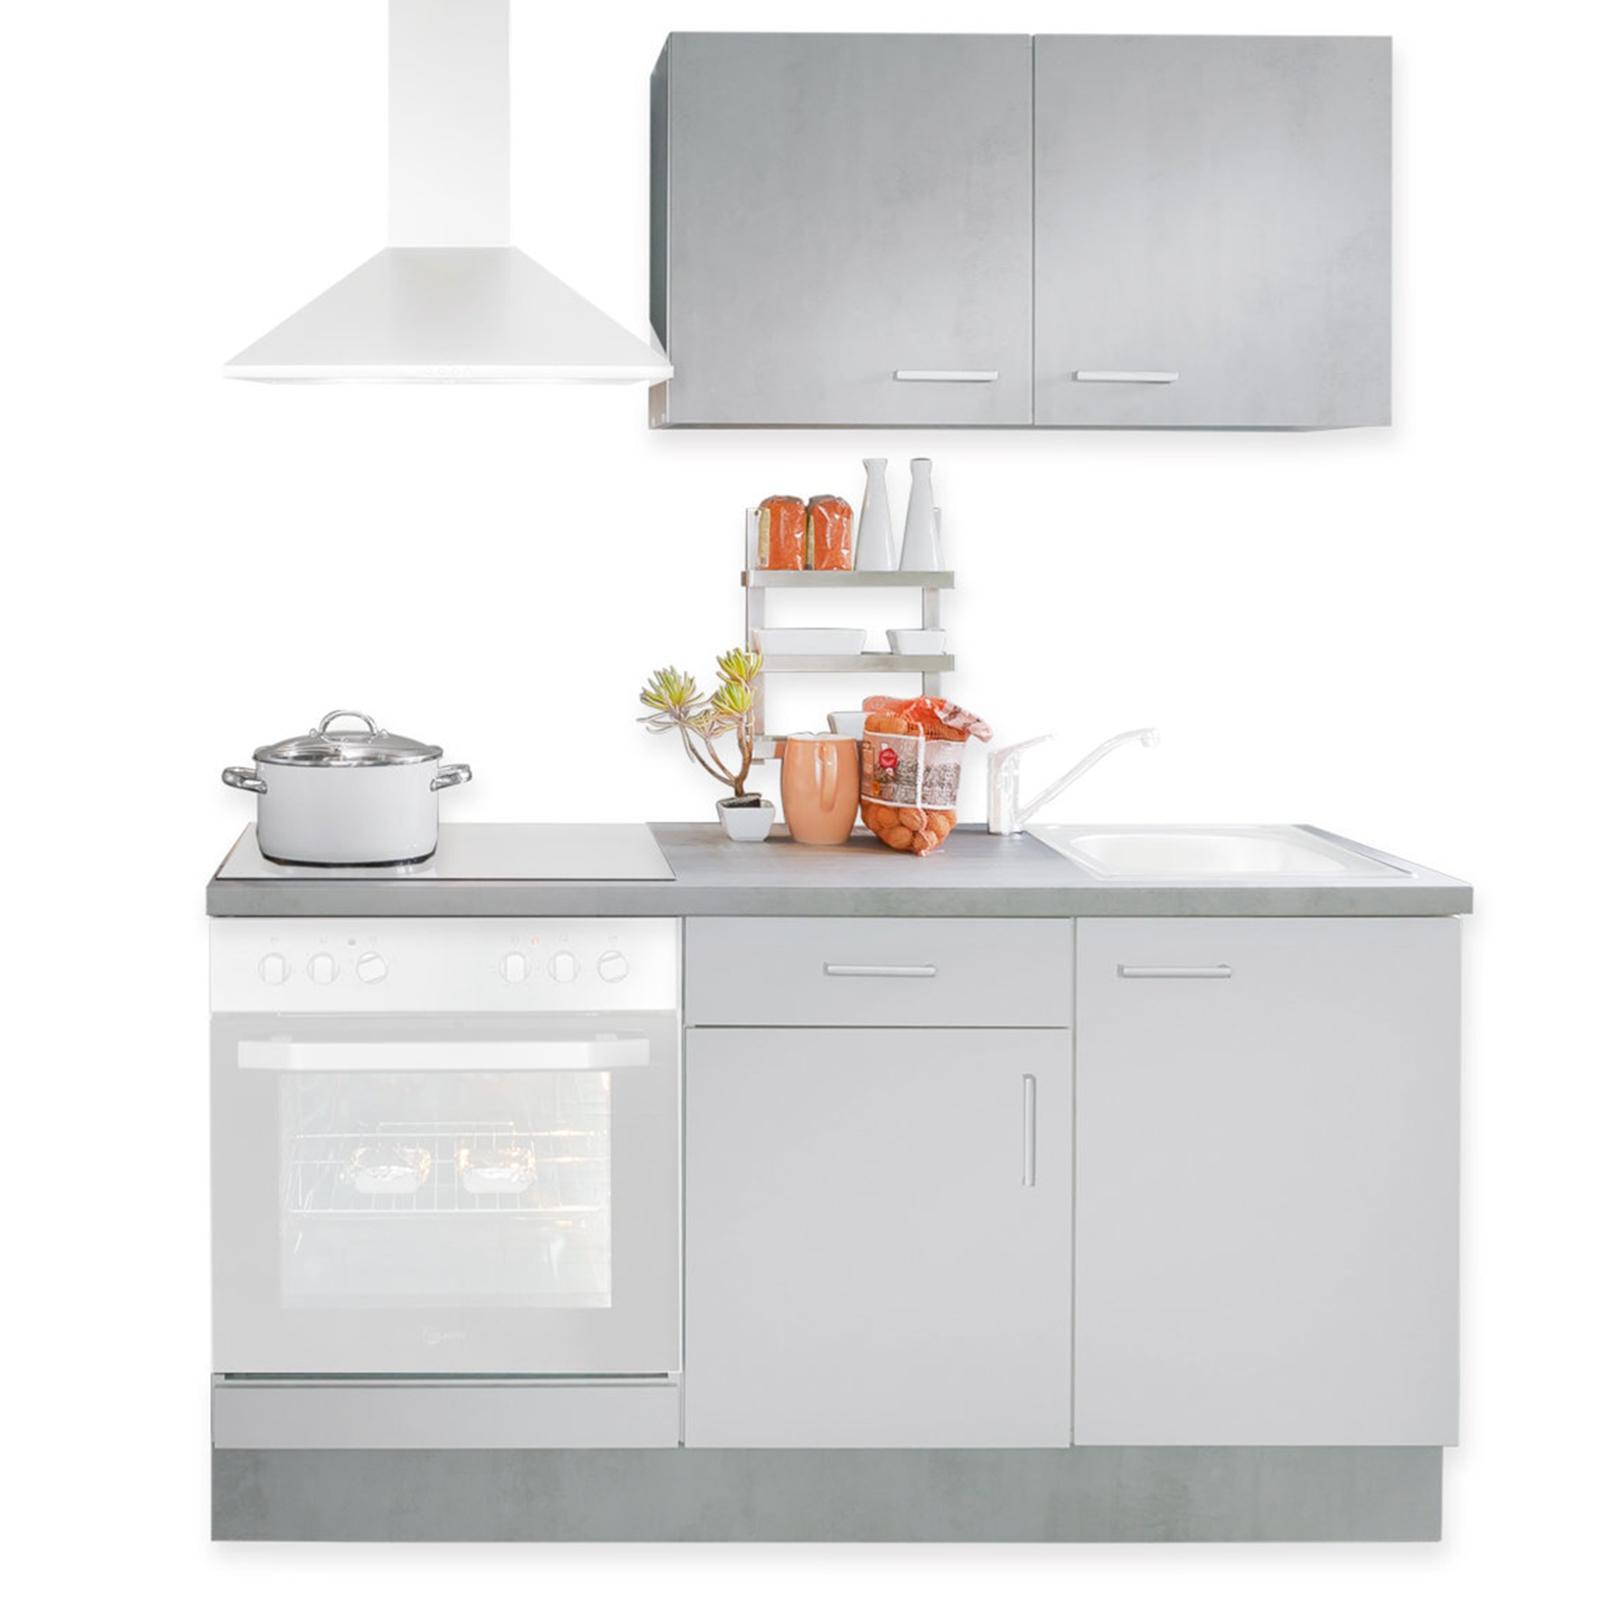 Mini-Küche - weiß - Beton-Optik - 160 cm